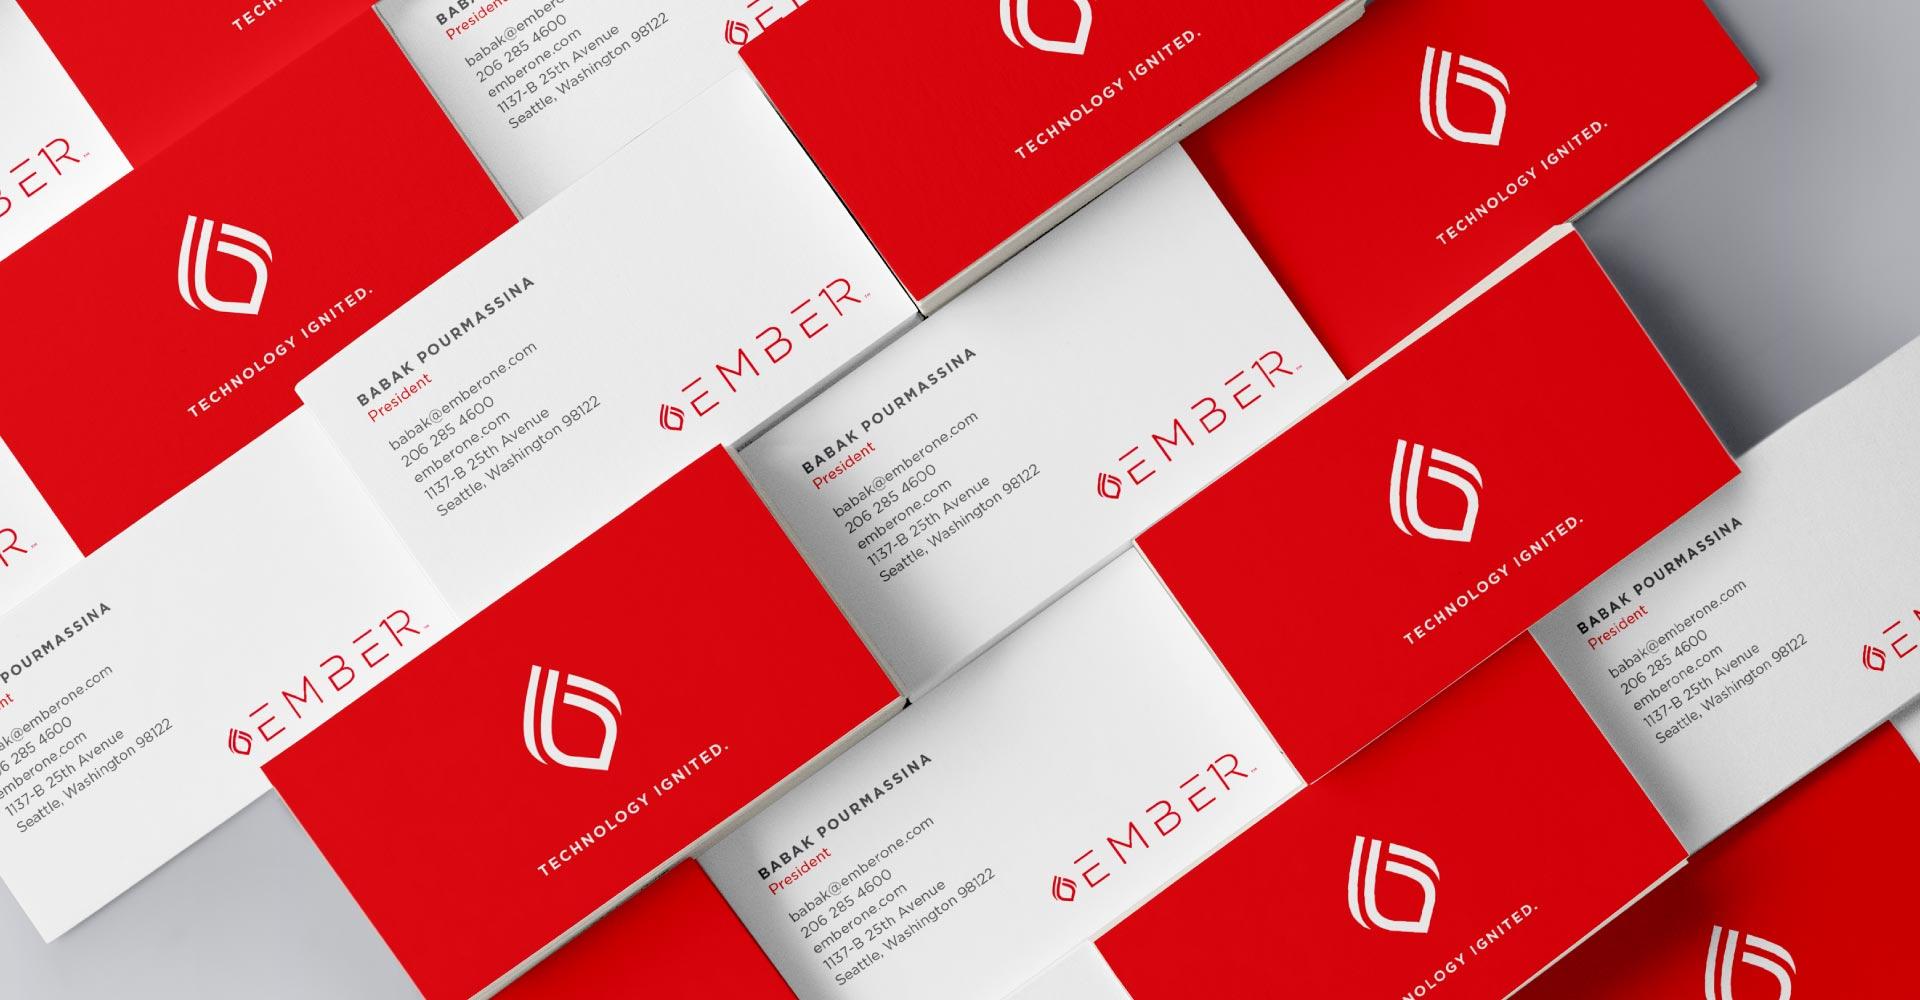 Creative_Retail_Packaging_Branding_Identity_Web_Design_Ember_05-1.jpg